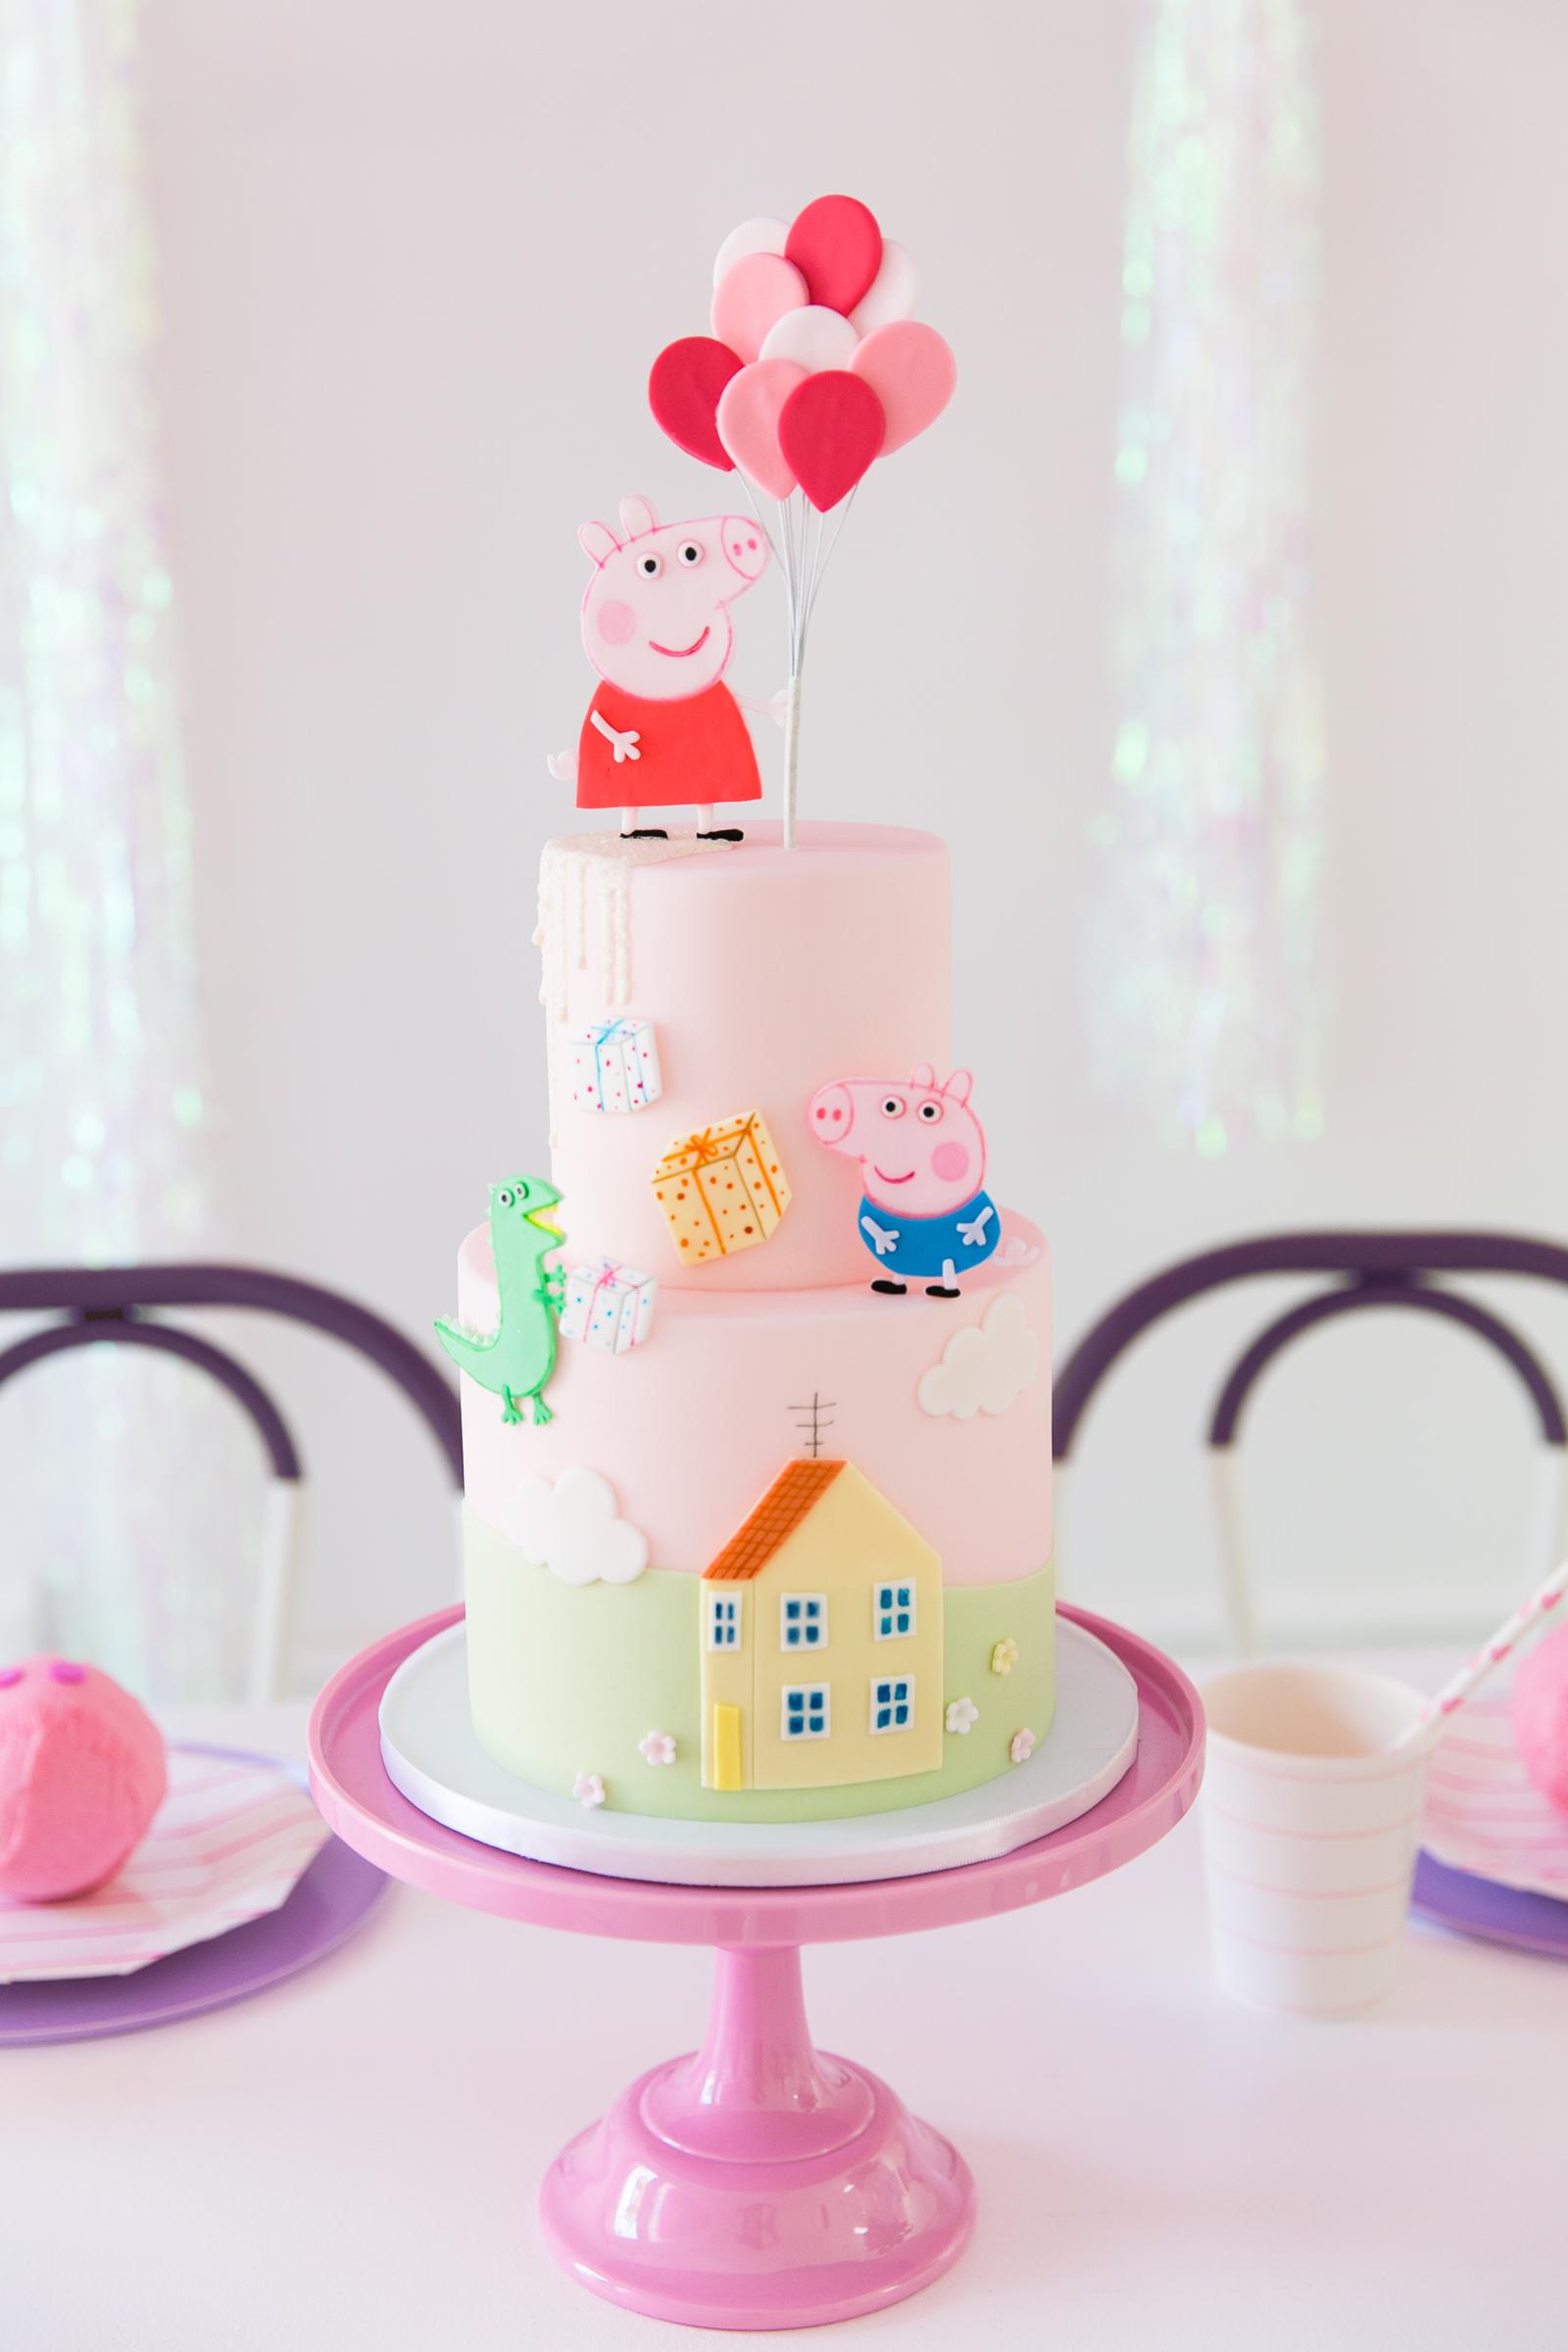 Oui Party - Peppa Pig Party - Peppa Pig Cake 2.jpg